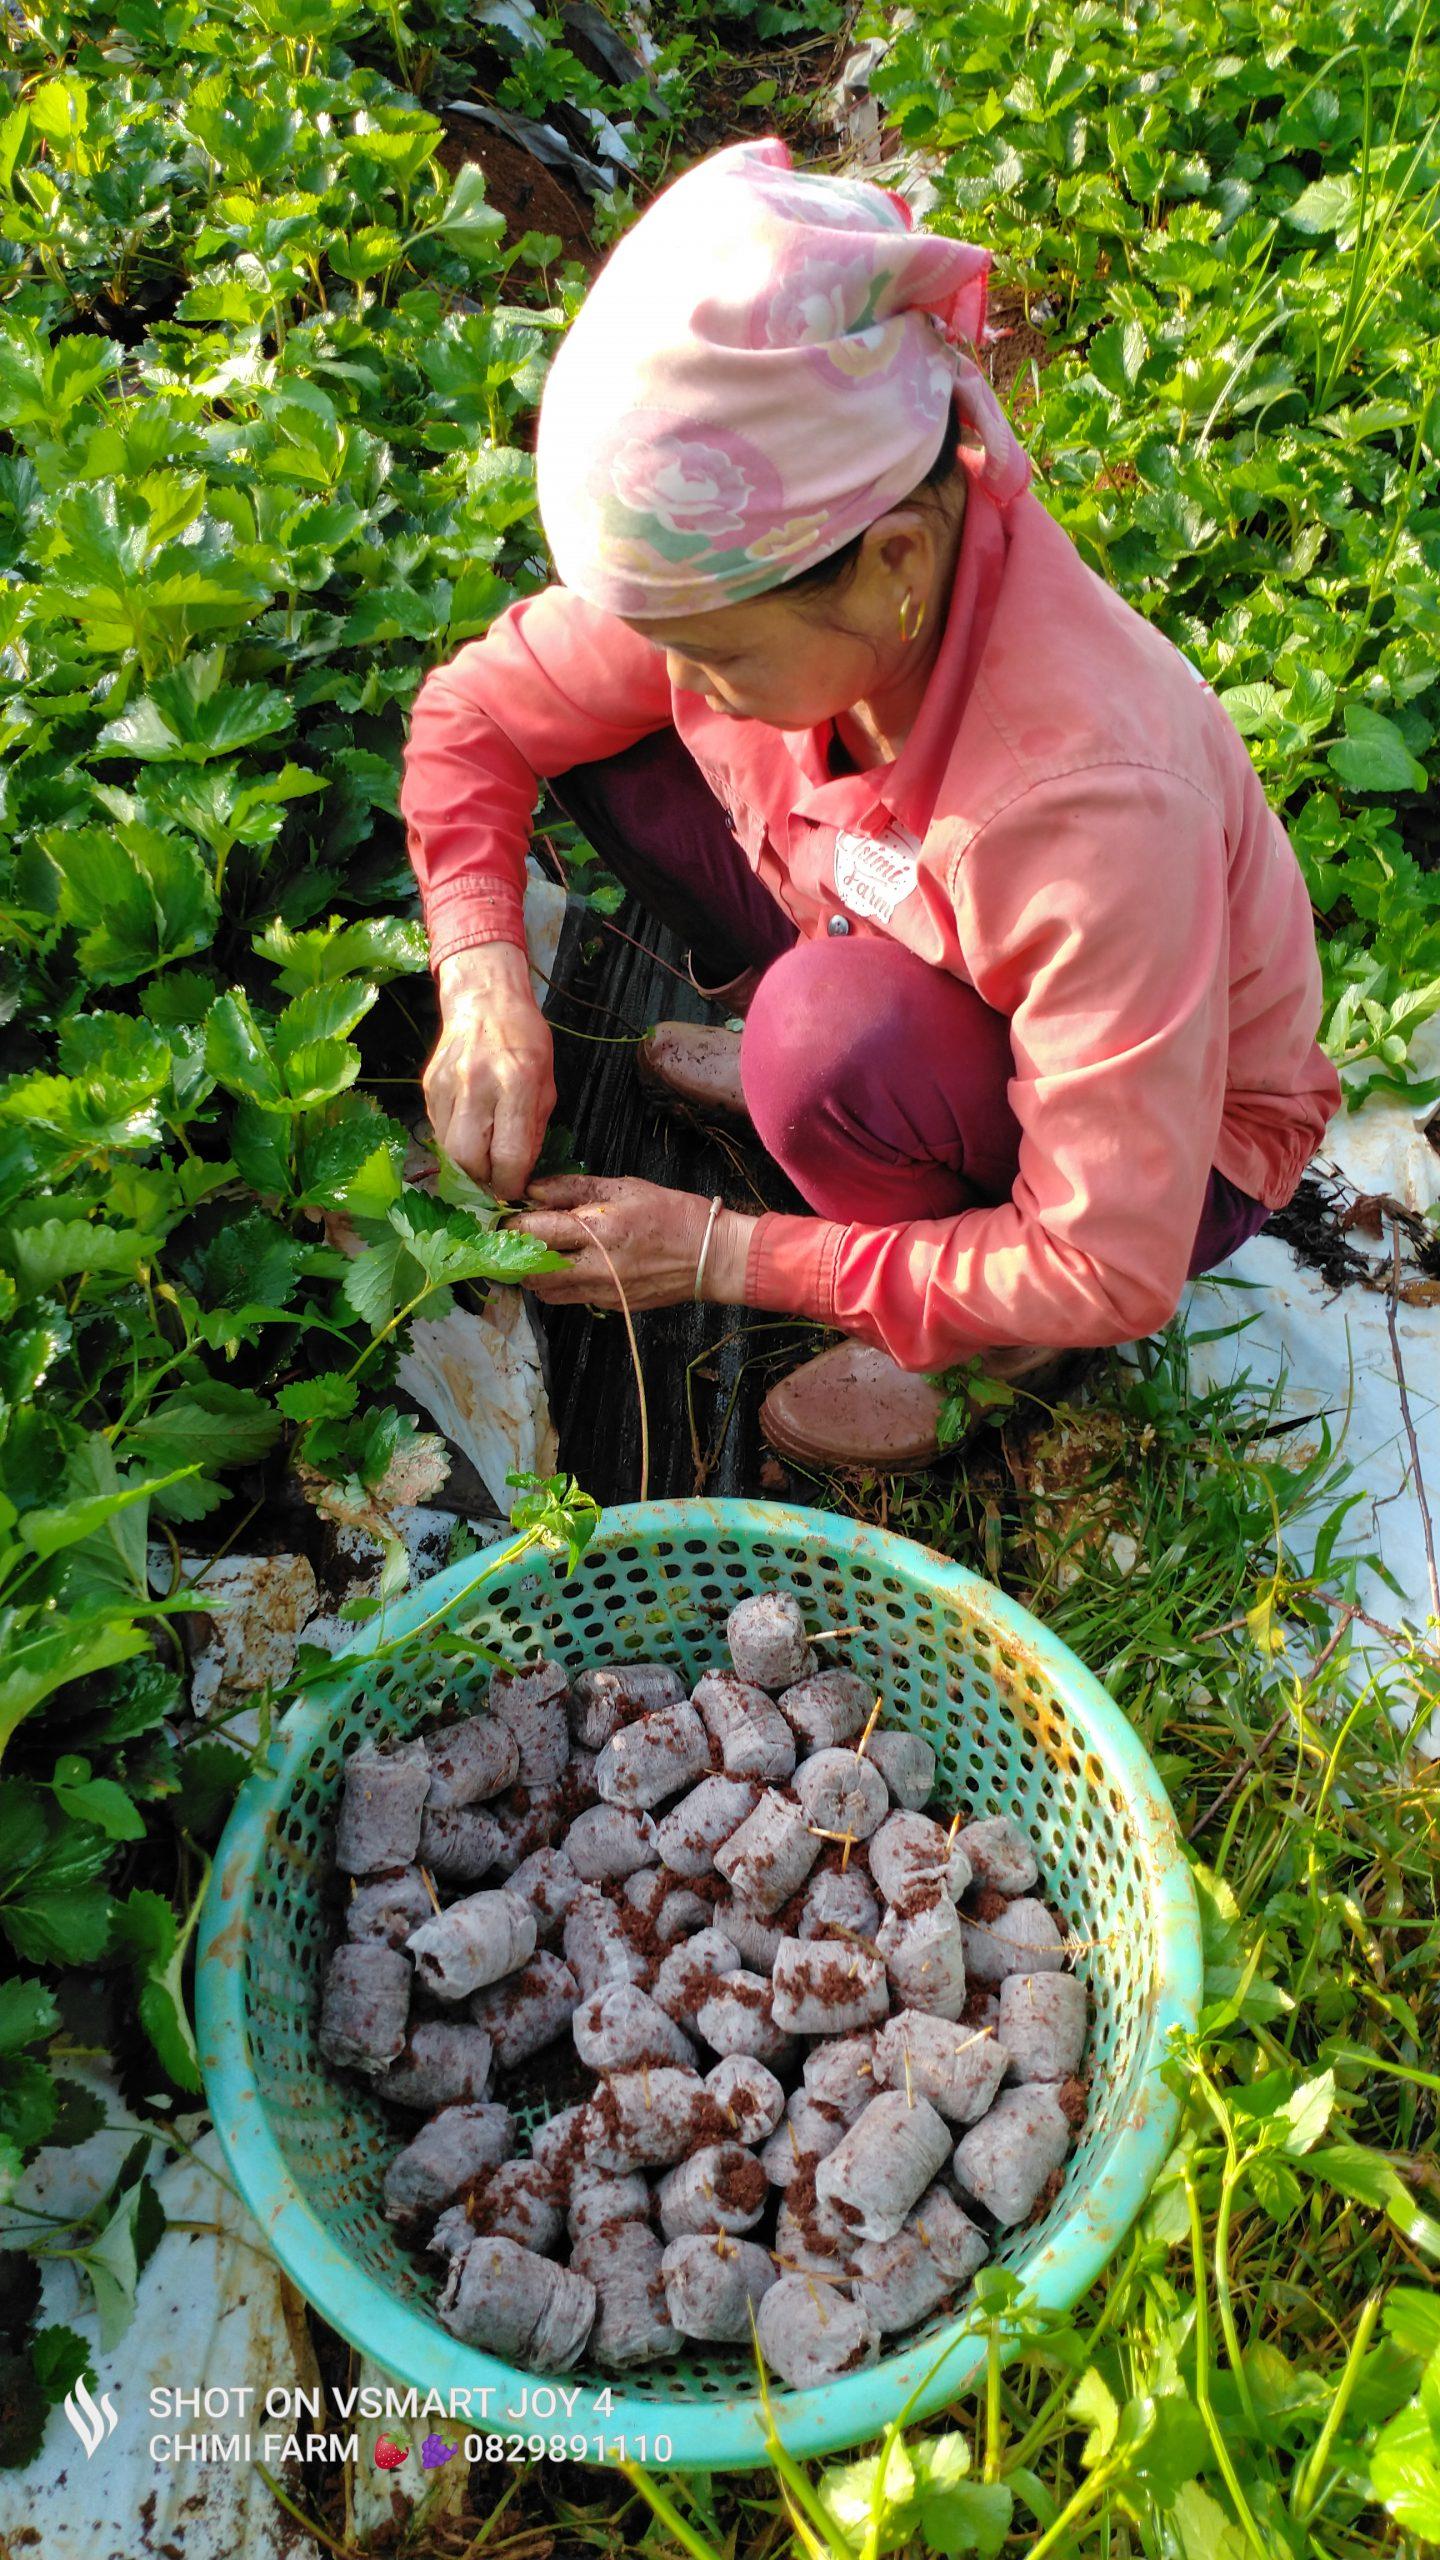 Mua cây dâu tây giống hana 082.989.1110